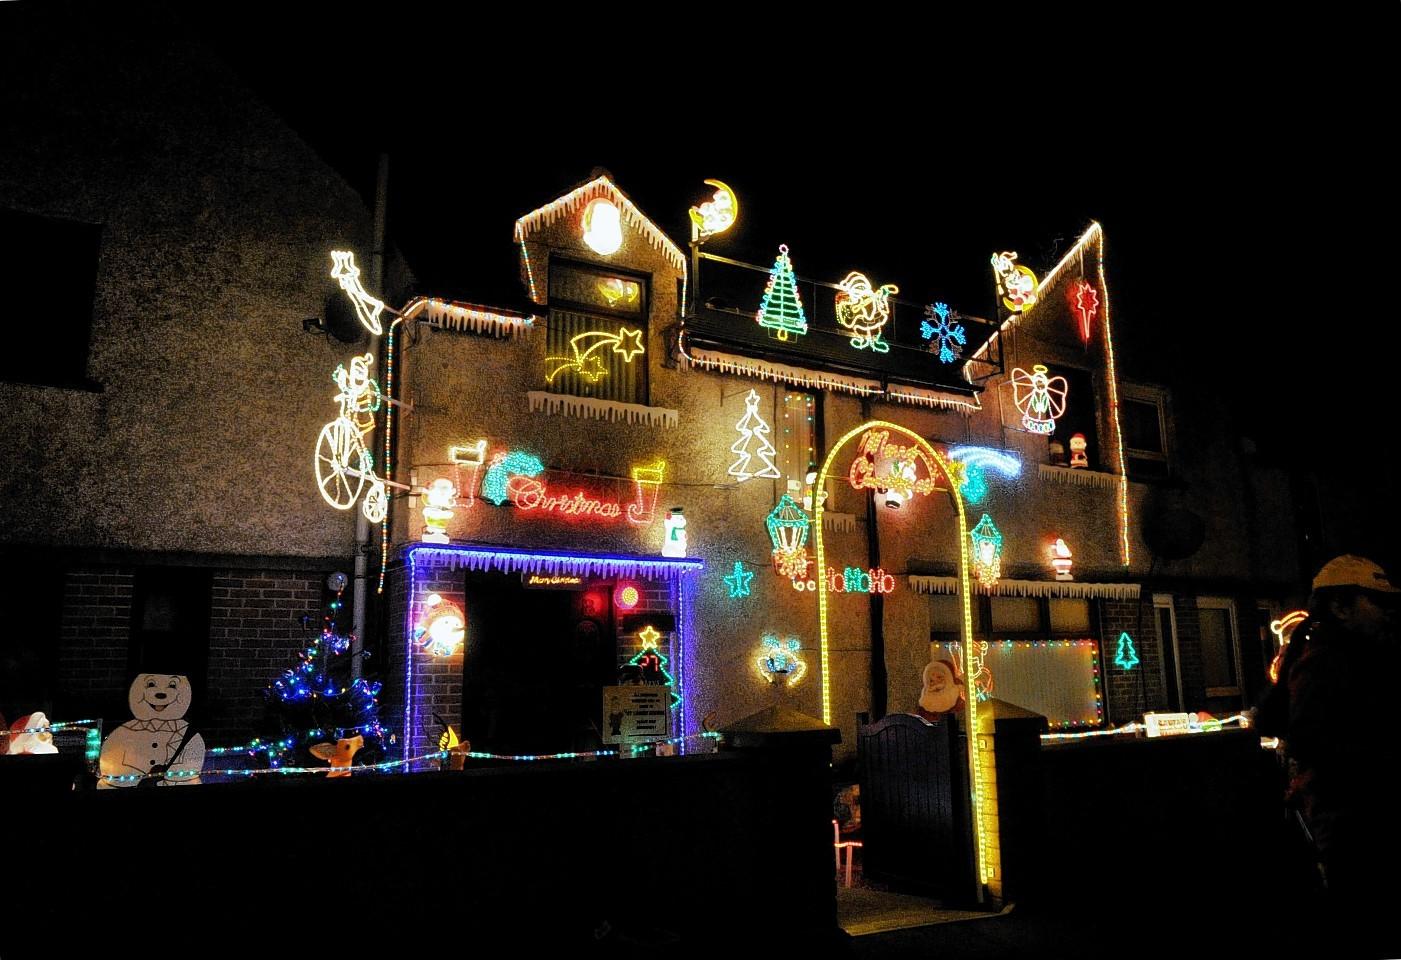 The McRobbie home last year.